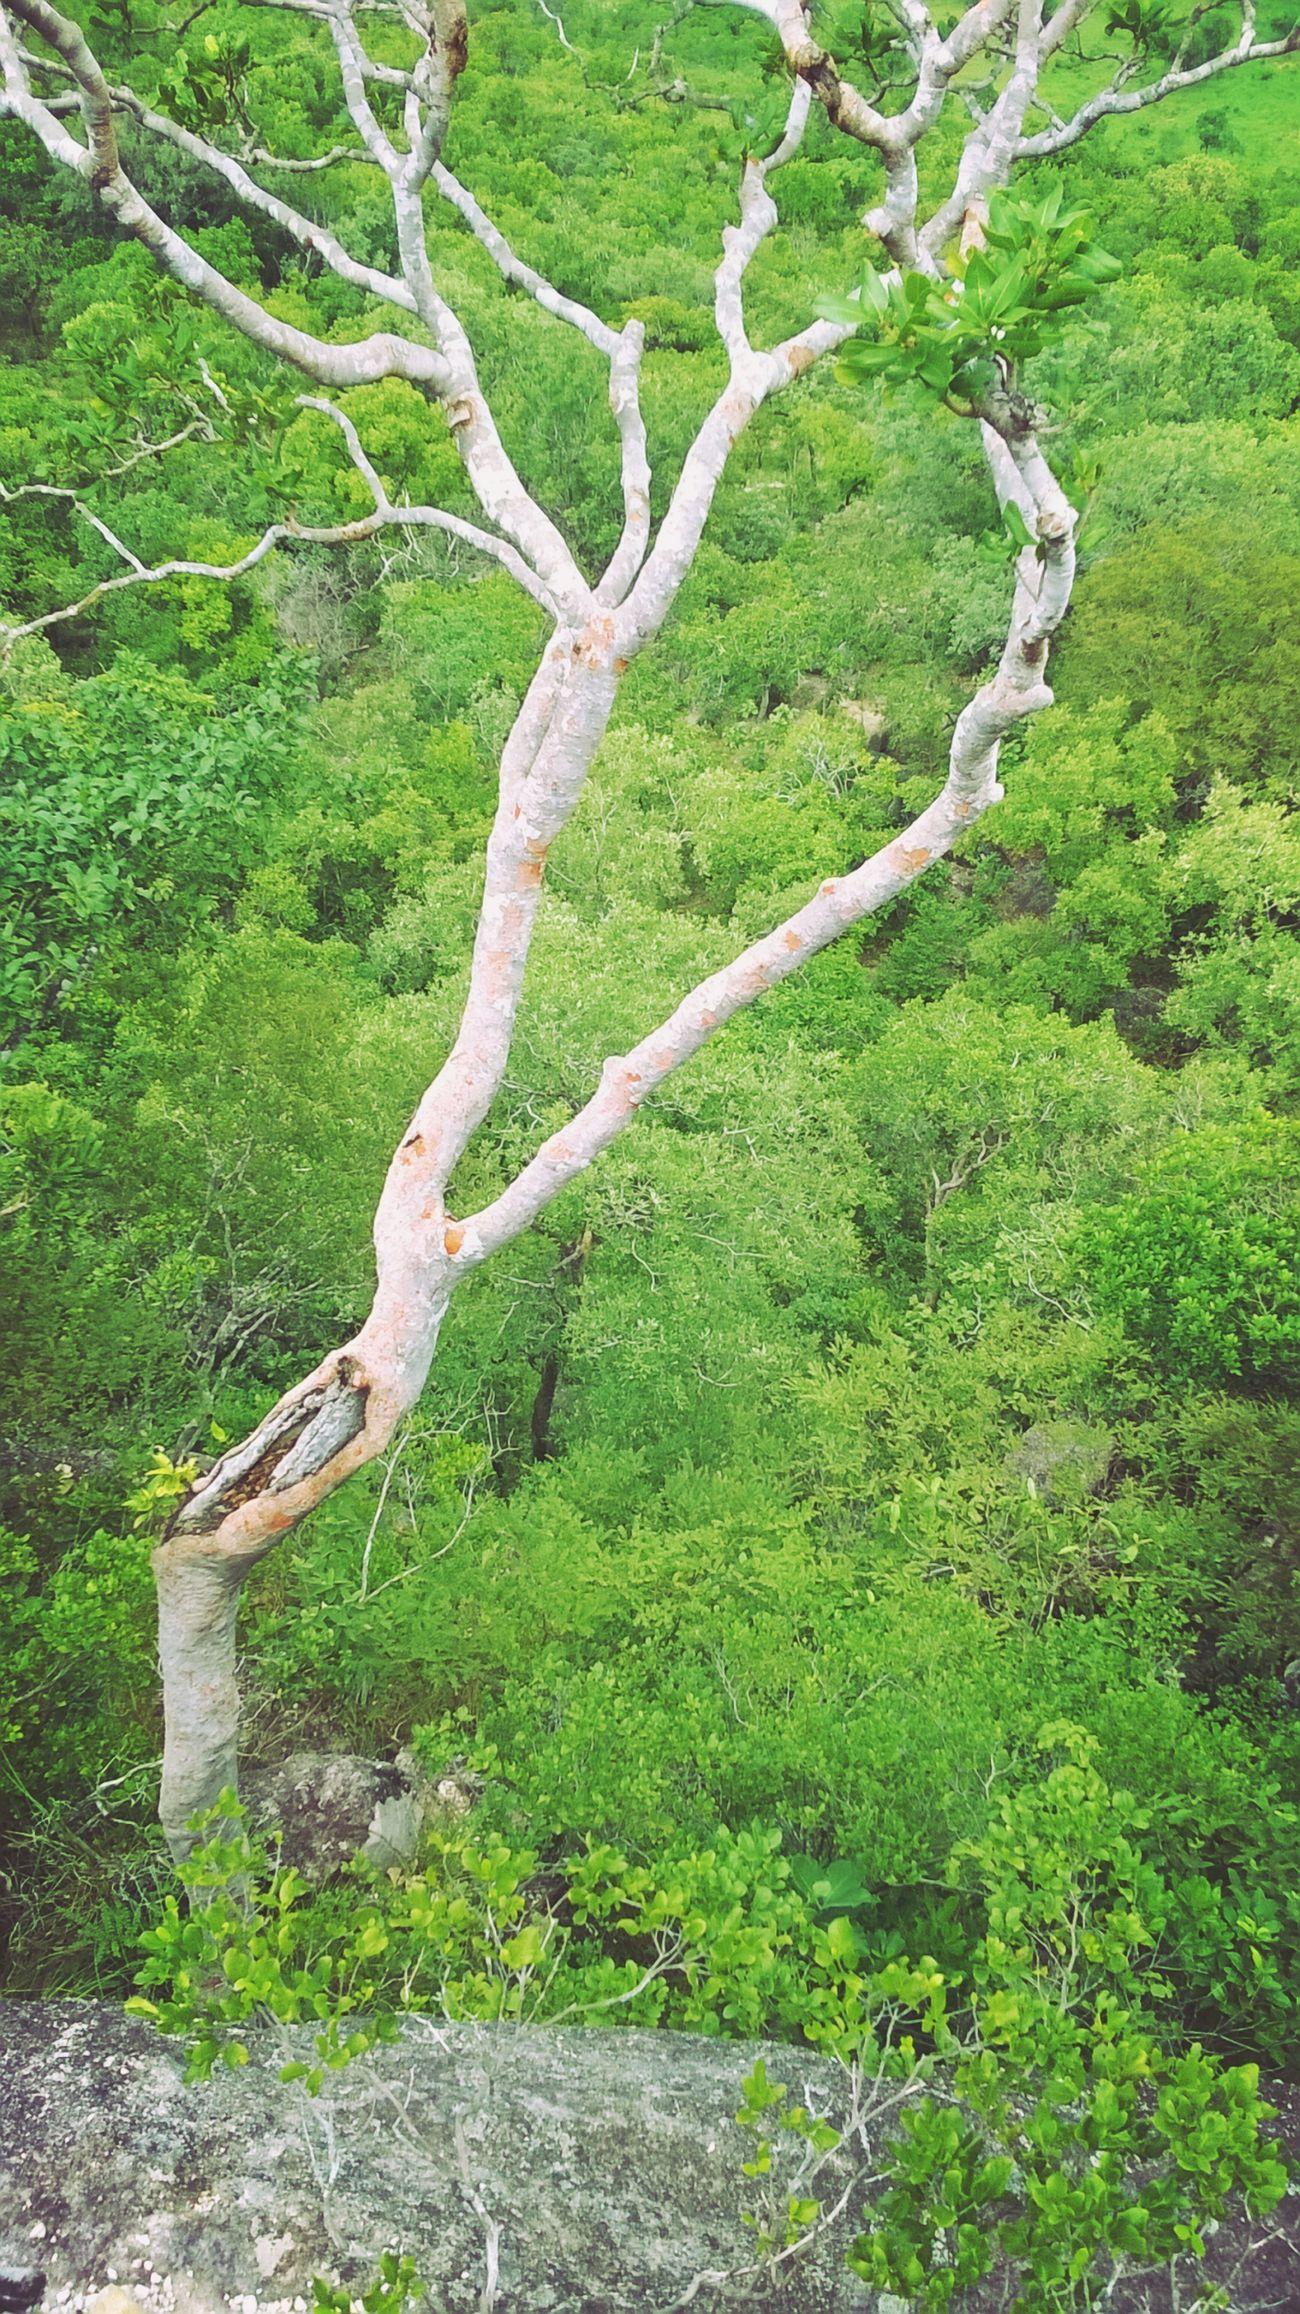 LoveNature Serradocarmo Brasil Nature_collection Naturenaturelovers Nature Photography